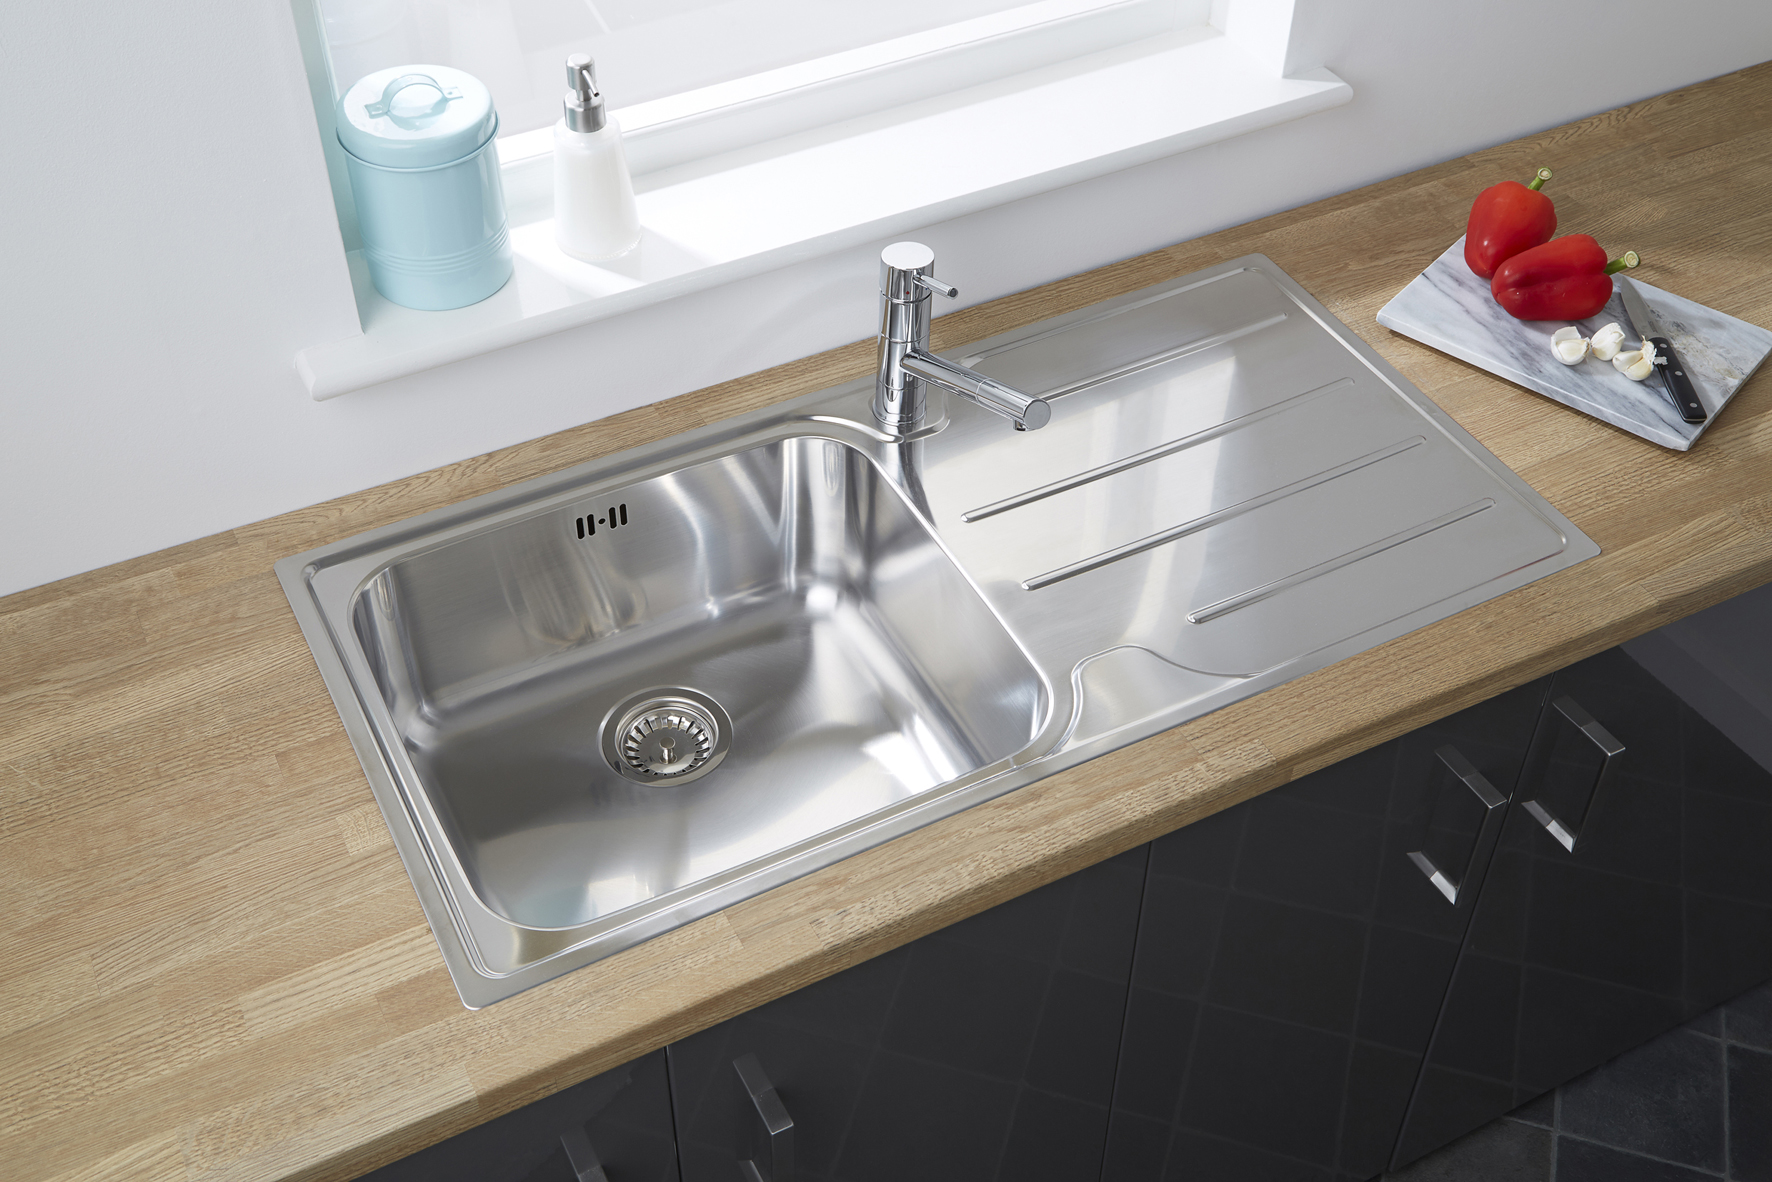 Astracast Kitchen Sinks Astra cast kitchen sink kitchen design ideas astracast launches the plateau sink archetech workwithnaturefo